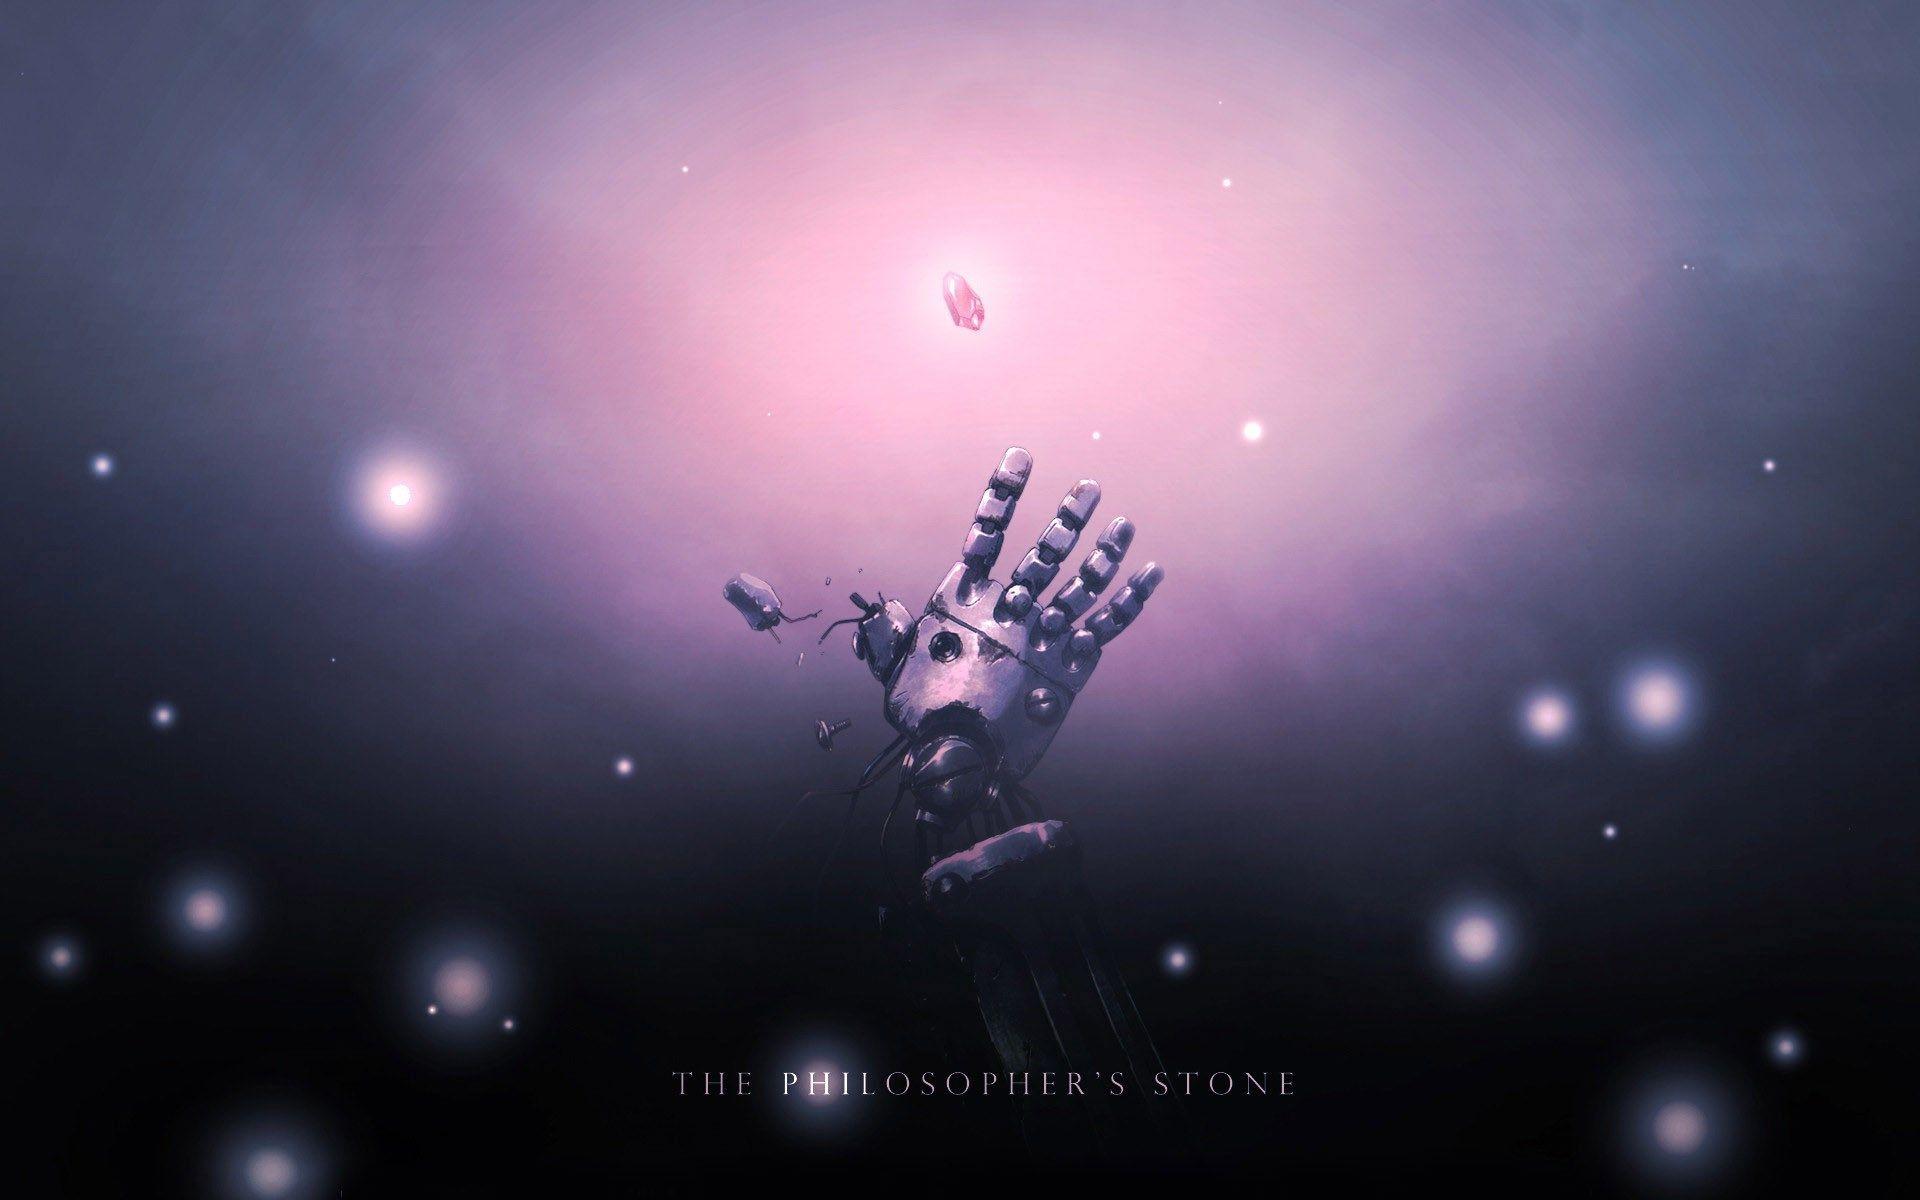 philosophers stone fullmetal alchemist hd wallpaper ...